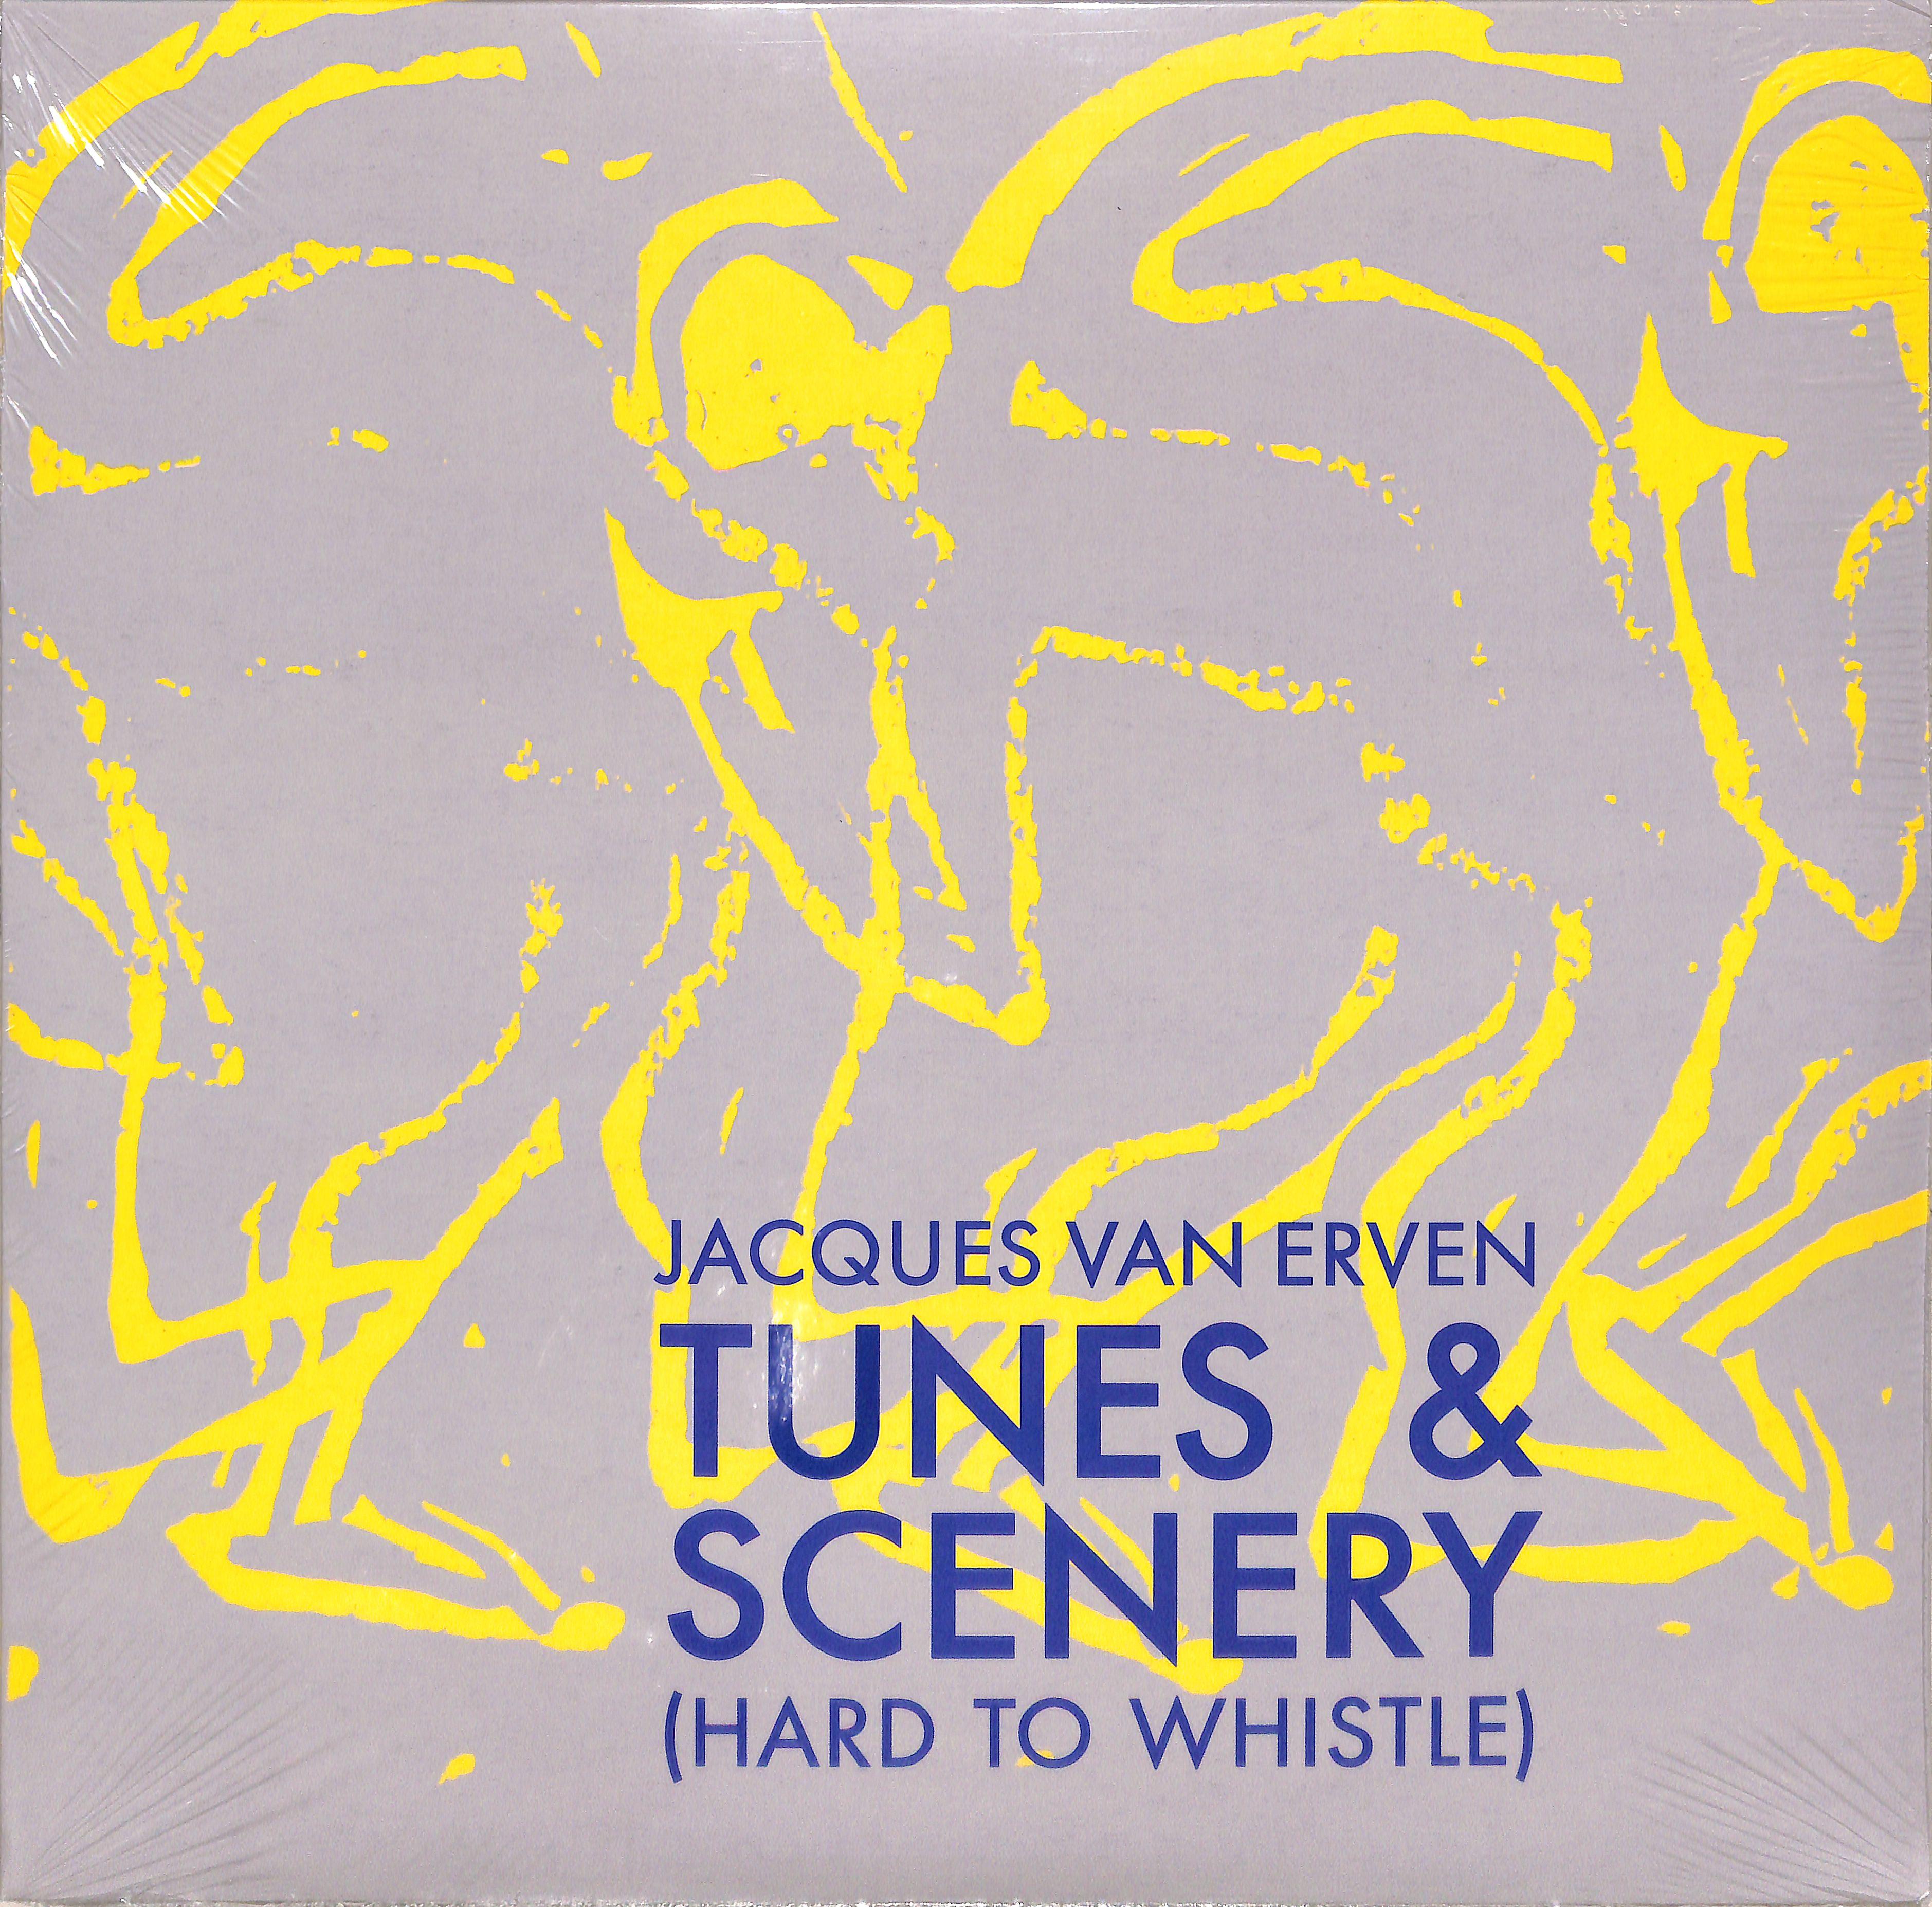 Jacques van Erven - TUNES SCENERY